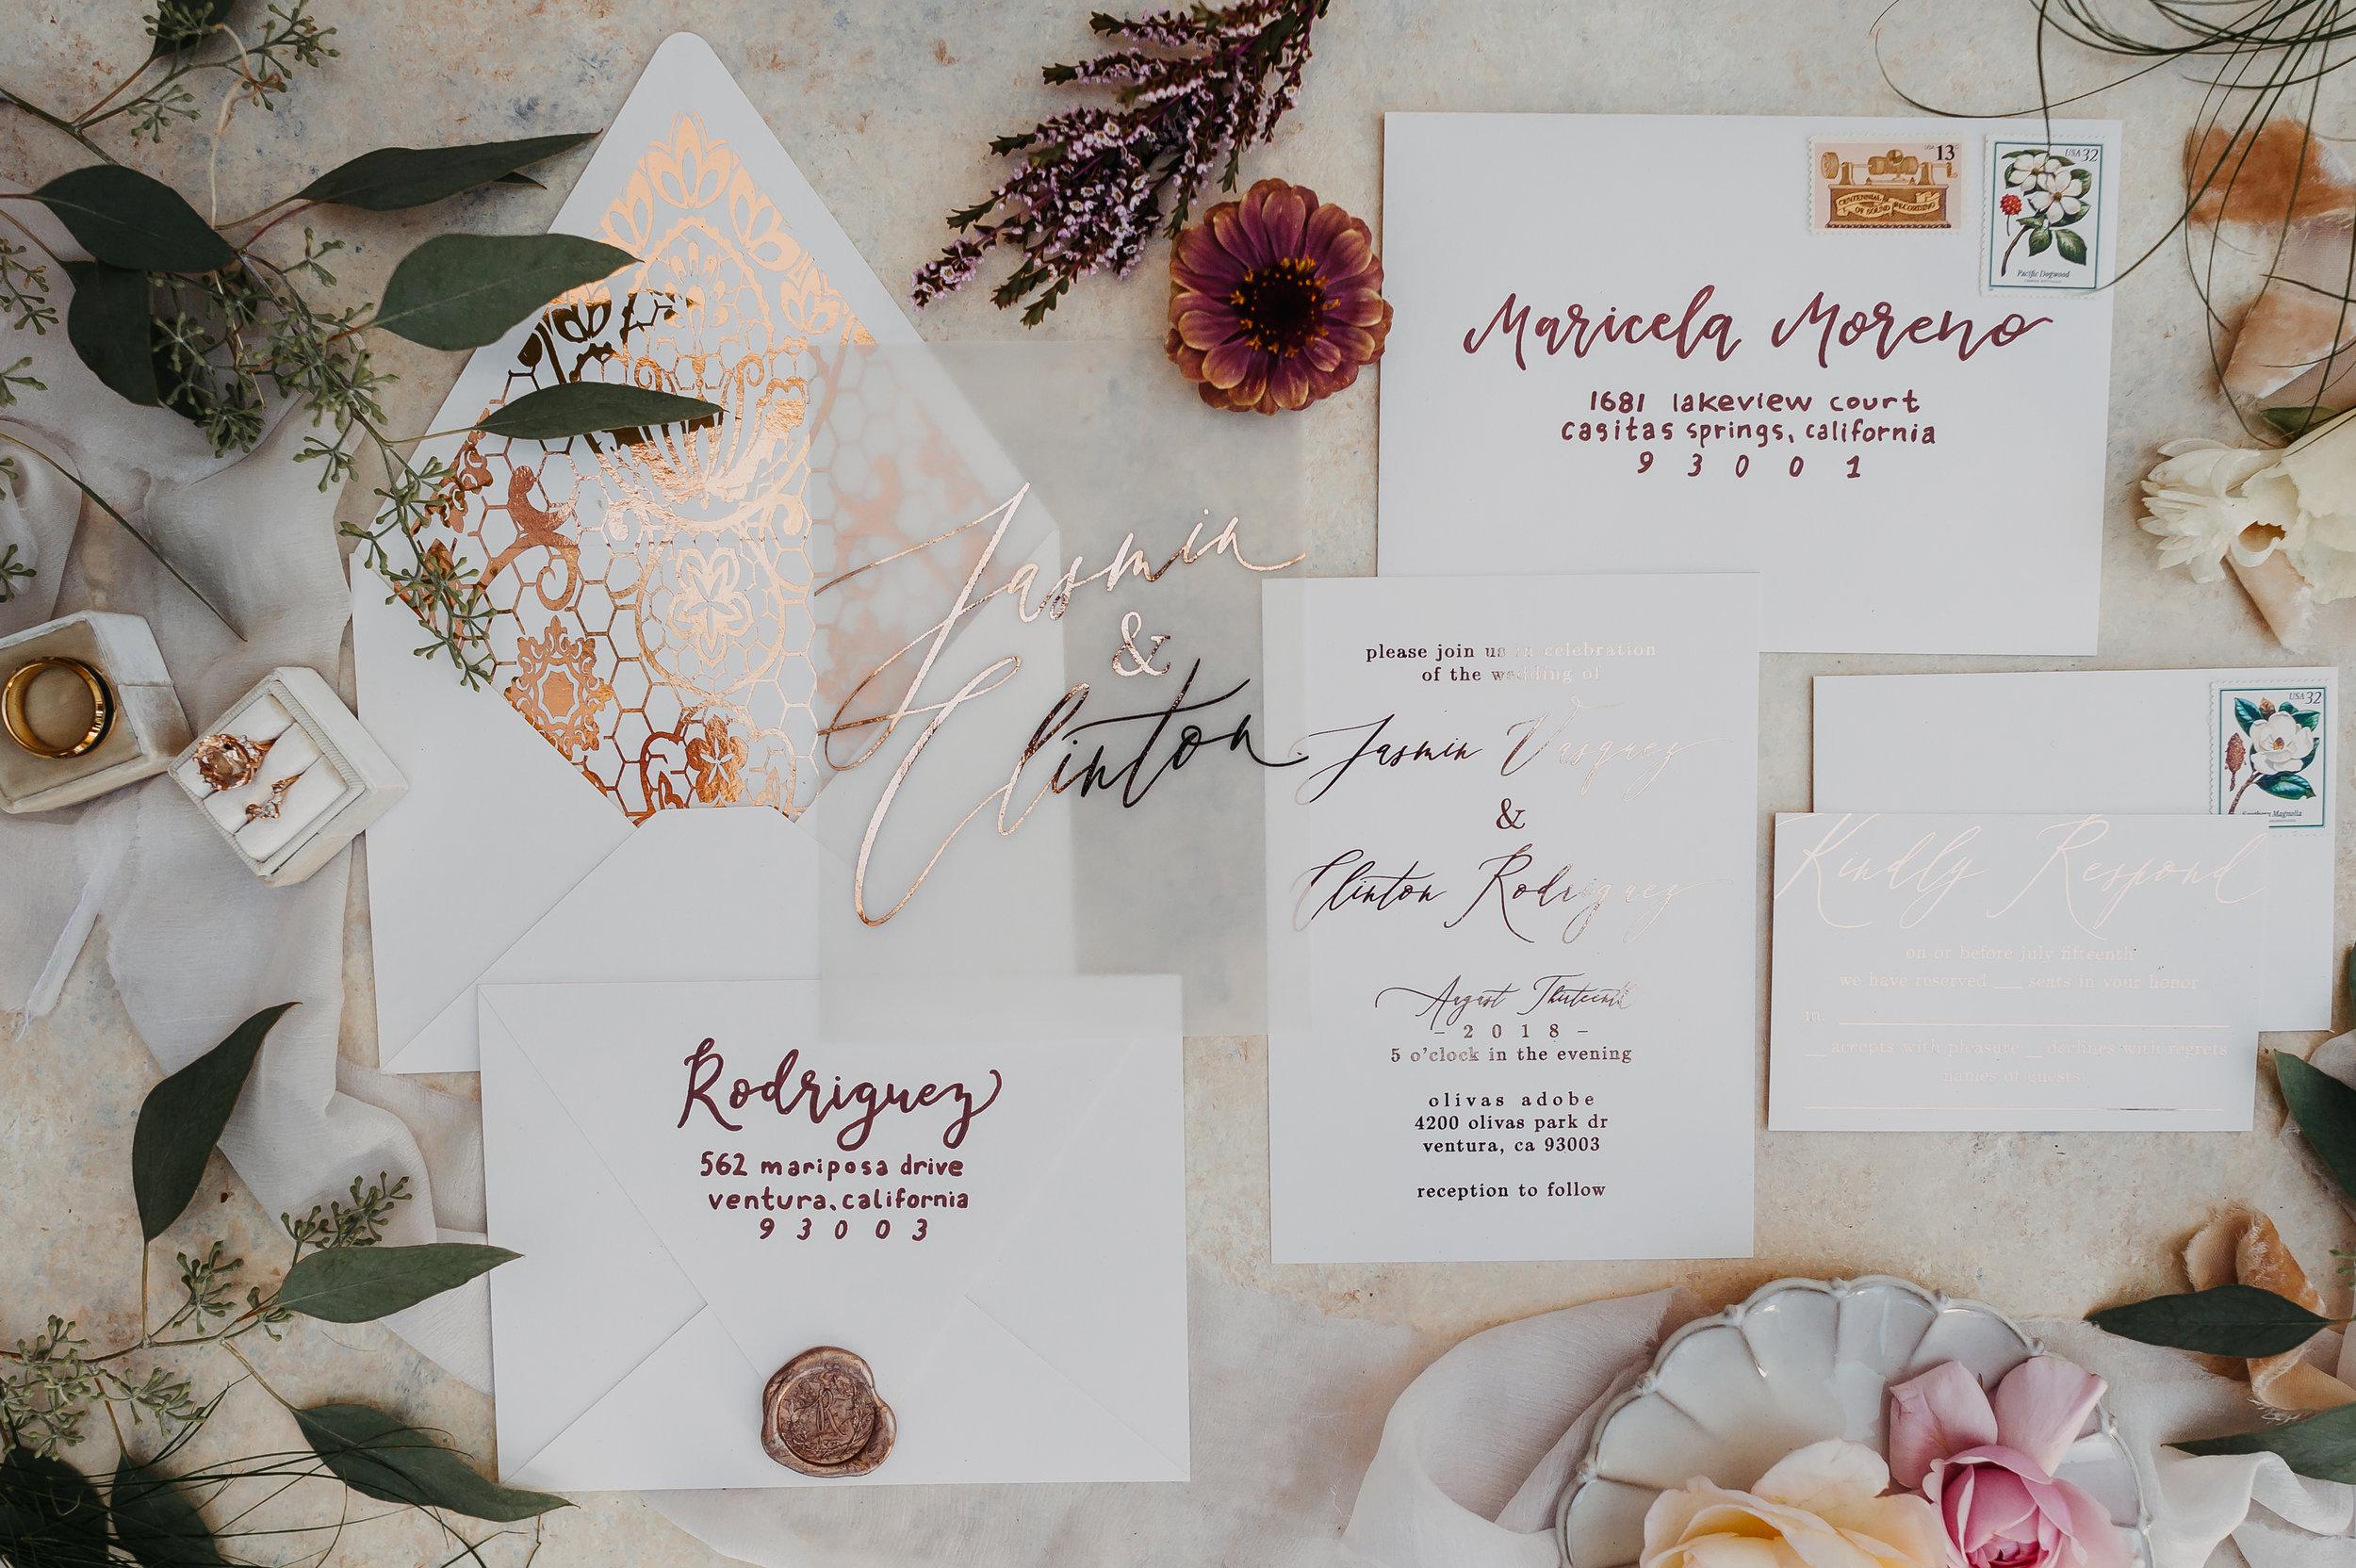 www.santabarbarawedding.com | Michelle Ramirez Photogrpahy | Olivas Adobe | Karen Marie Events | Tangled Lotus | Sweet Sentimentality | Wedding Invitations and Rings